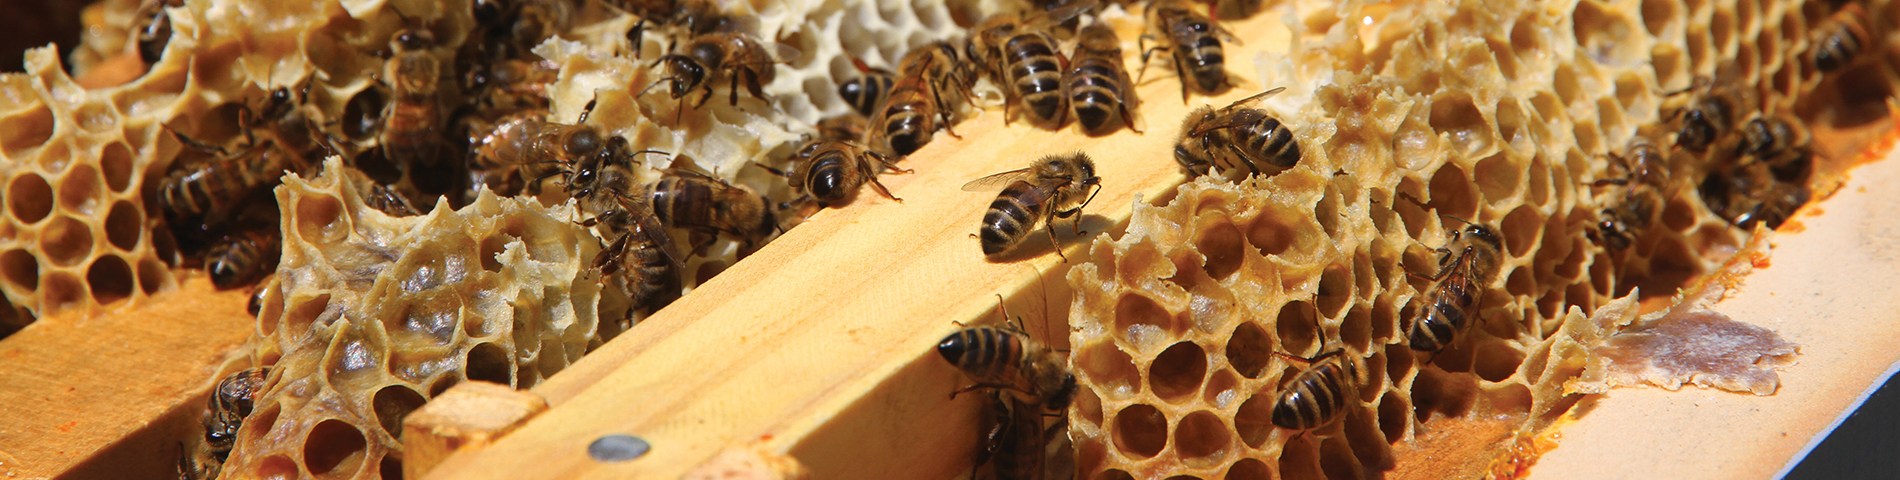 mainslideshow-background-image-beekeeping-club